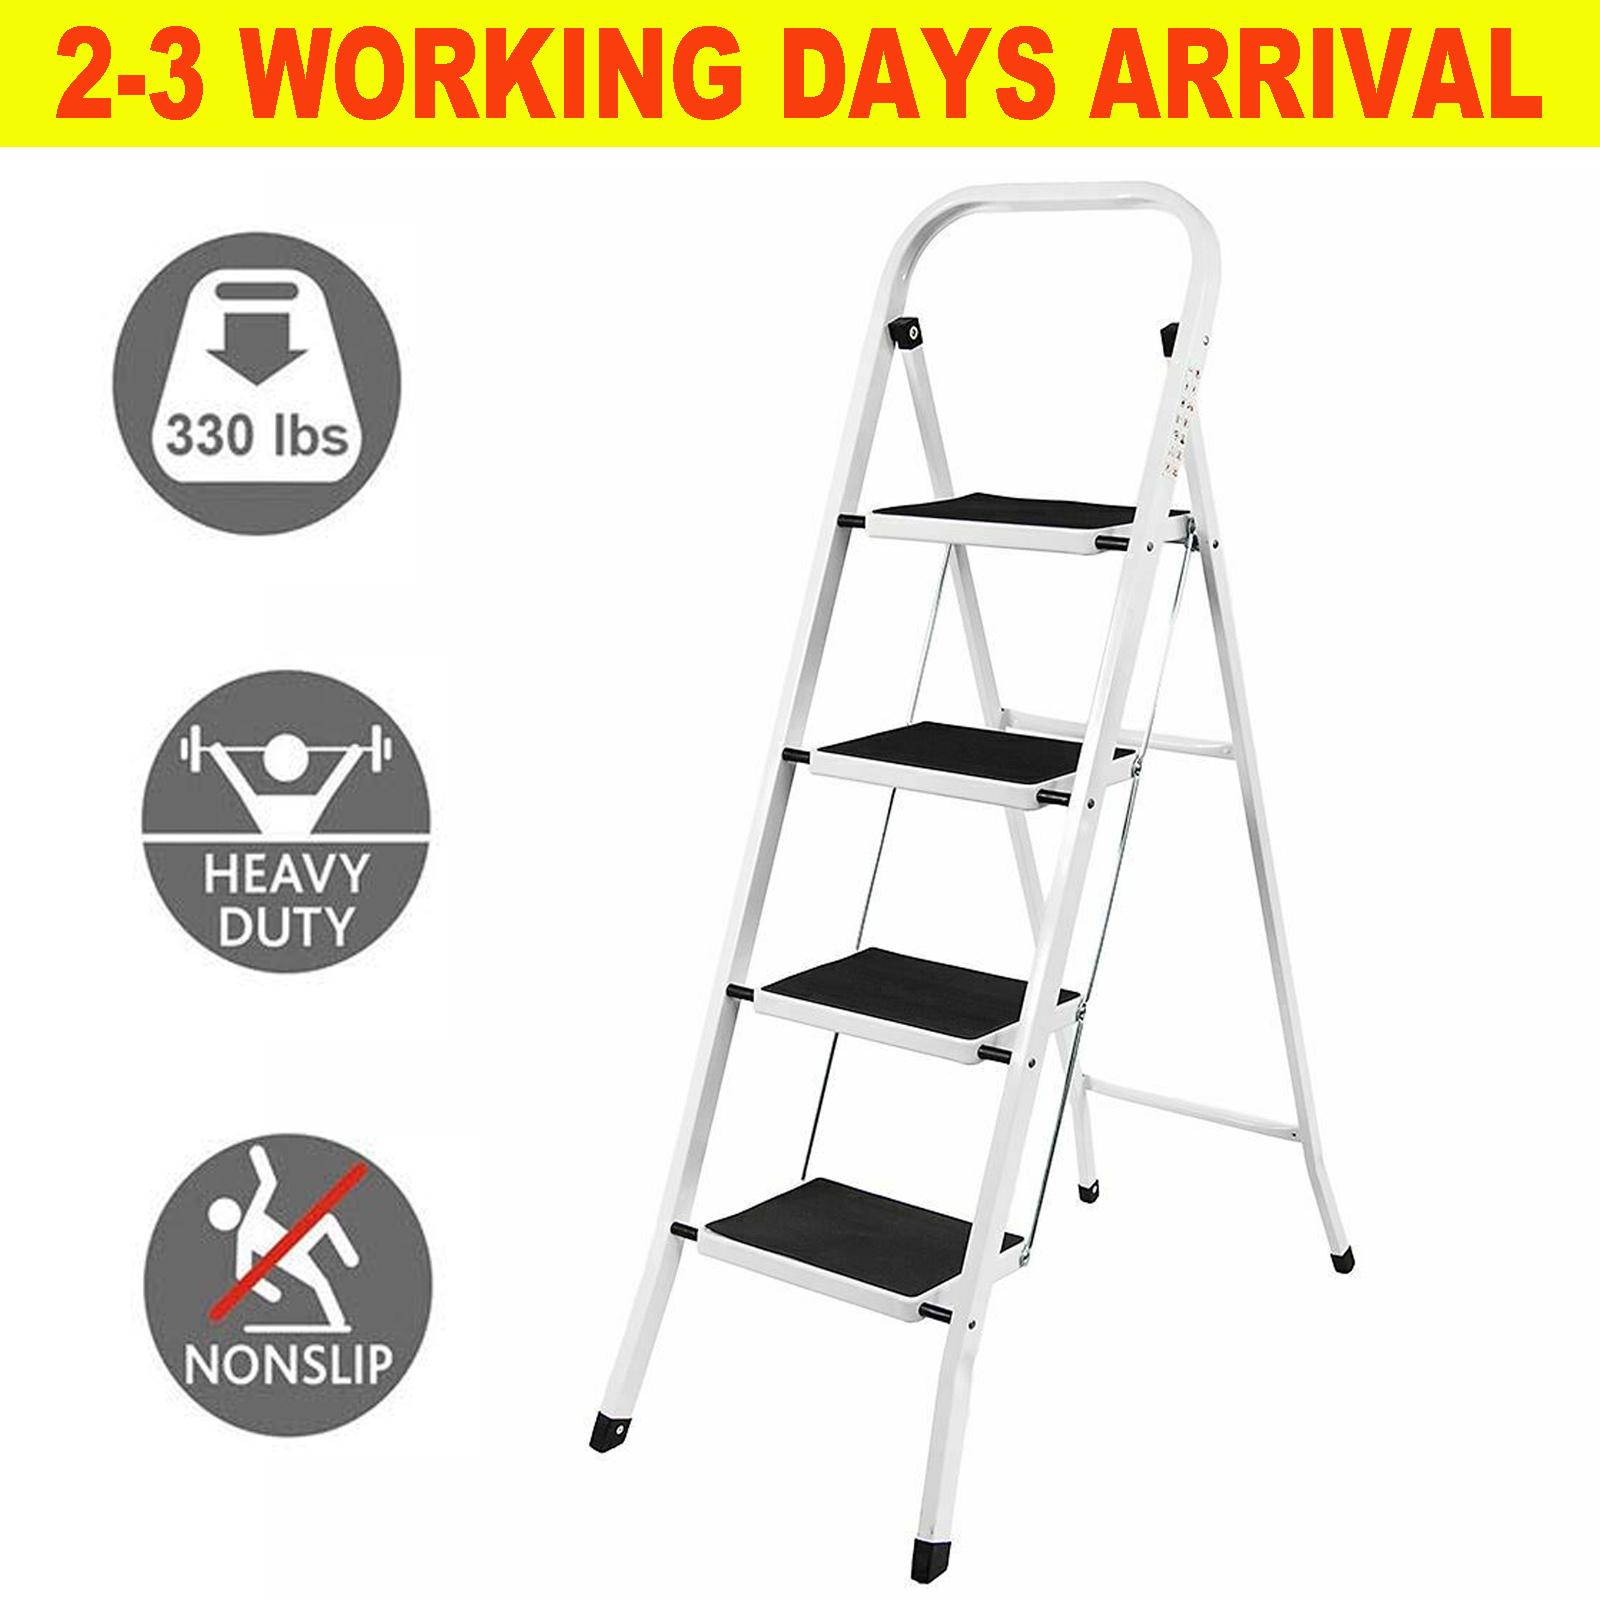 4step ladder steel folding portable wide non-slip step heavy